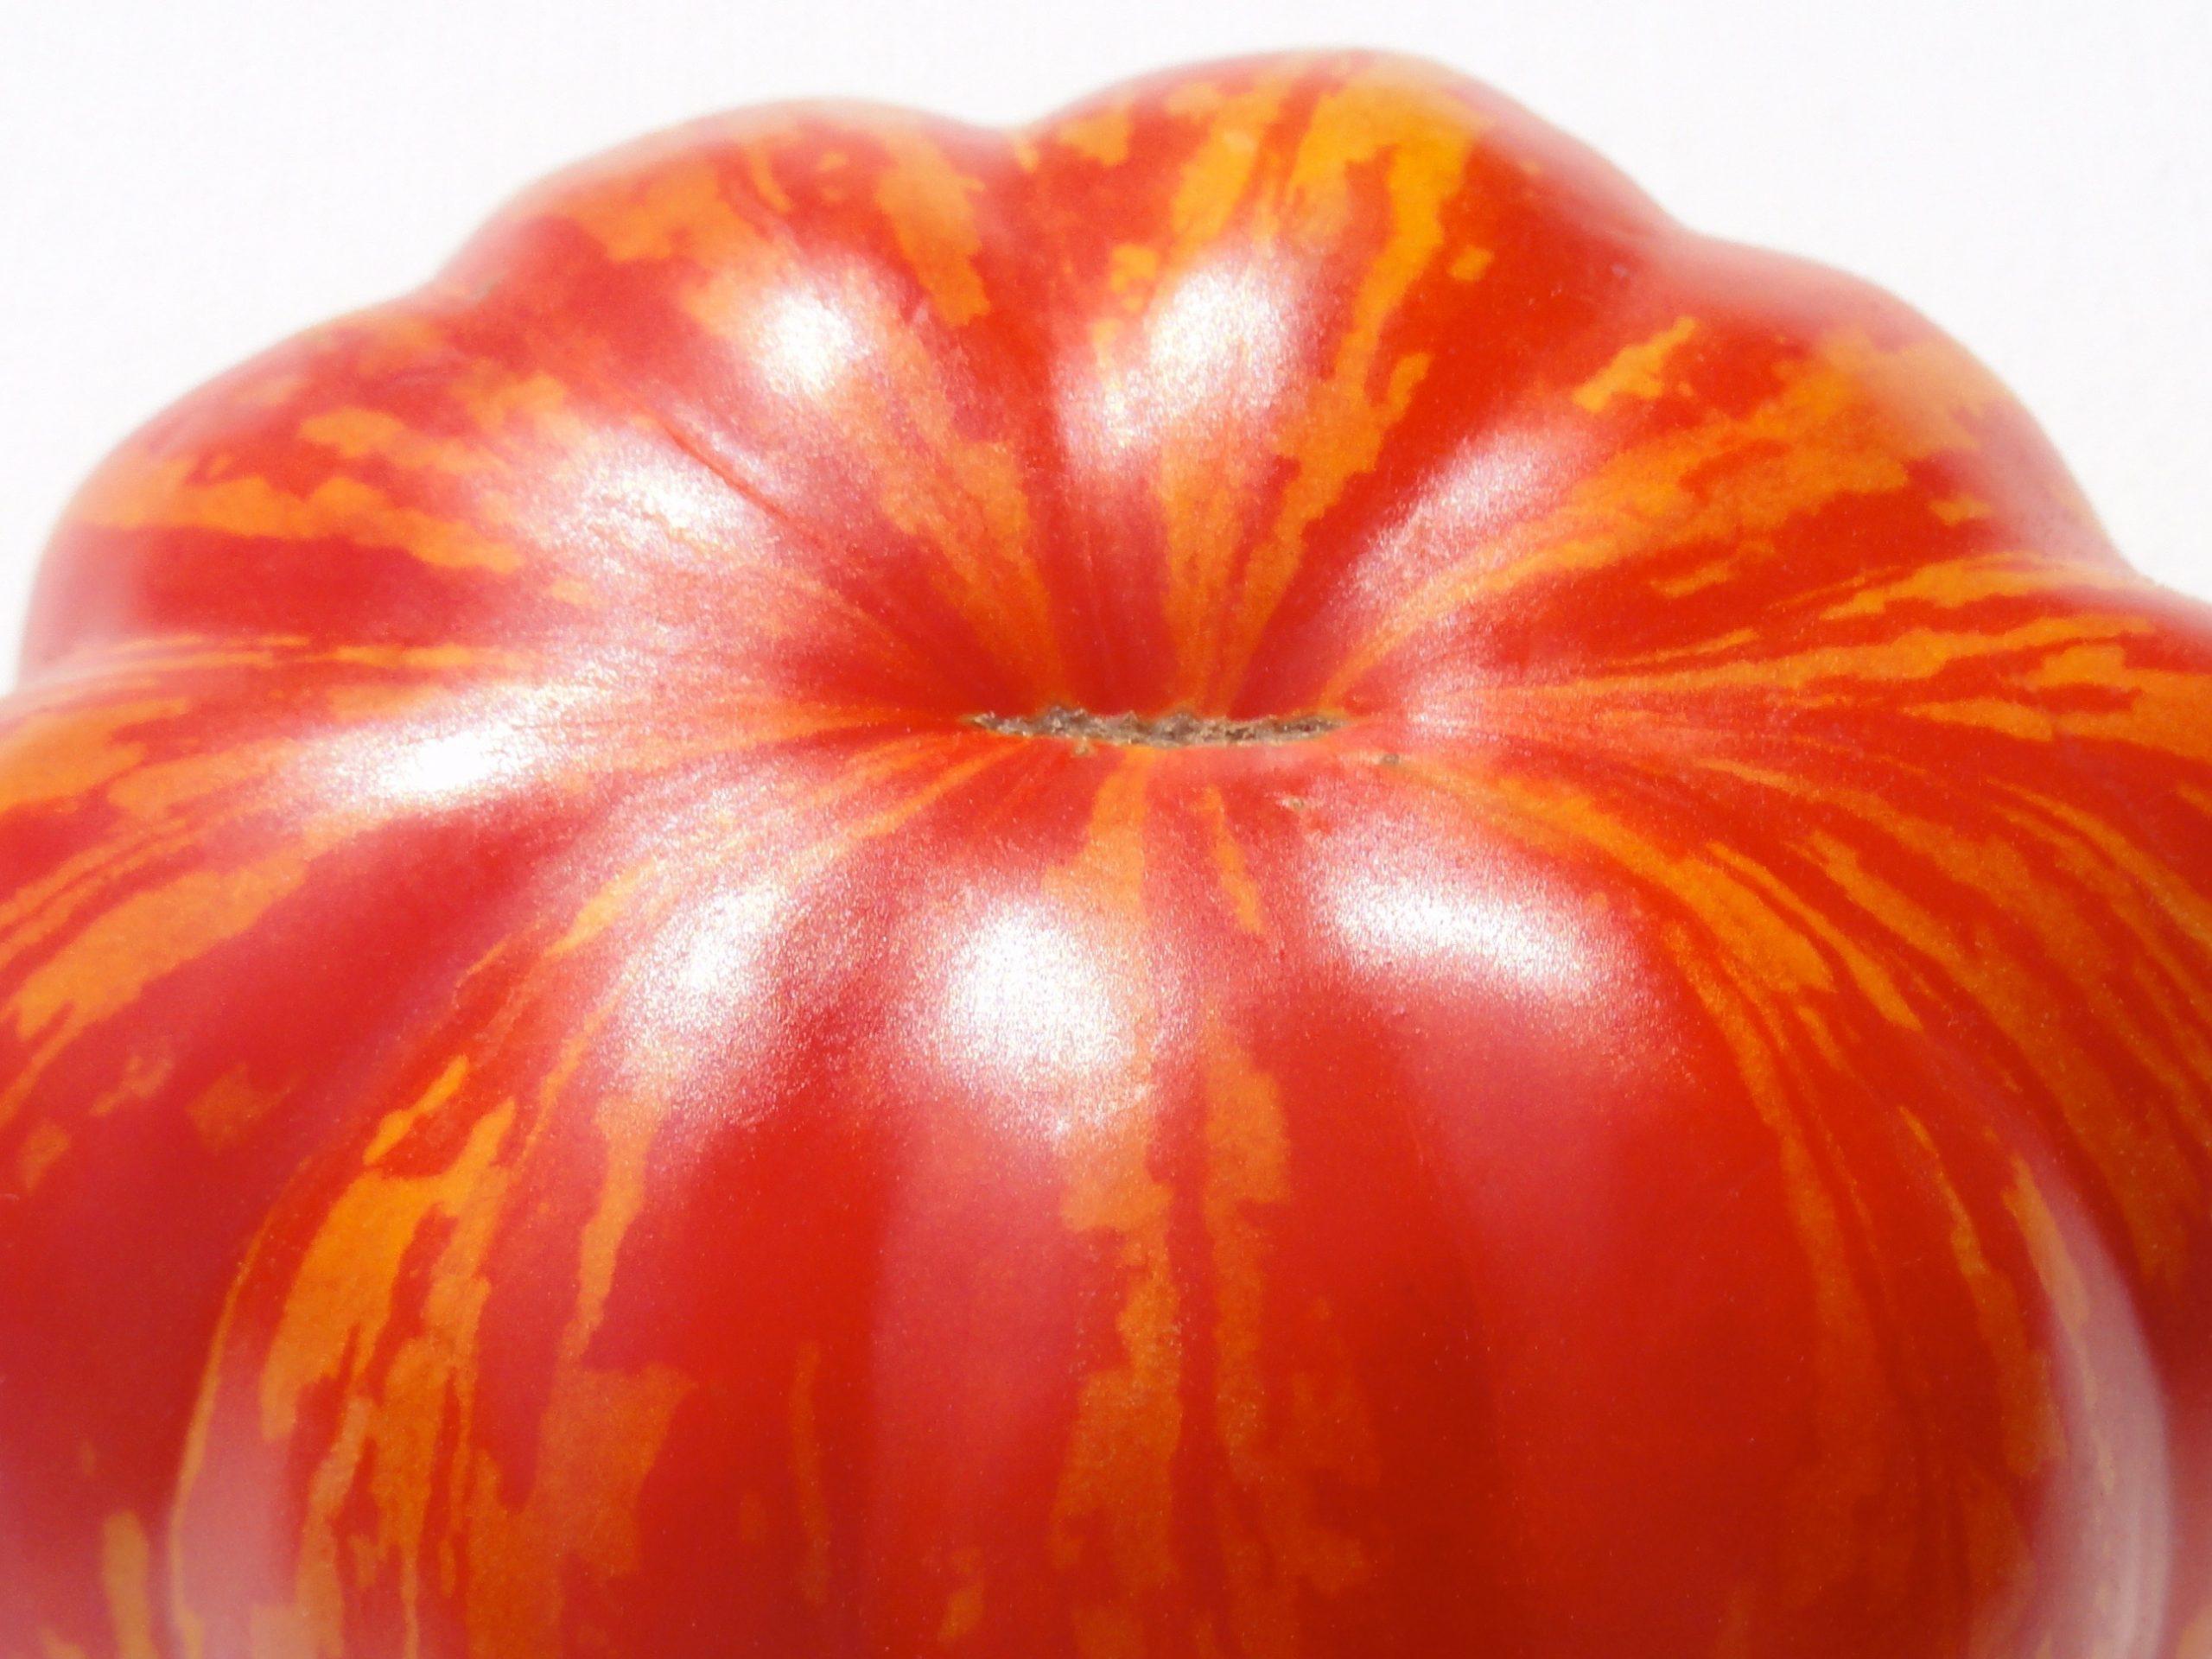 marmande tomato © KIM JONKER